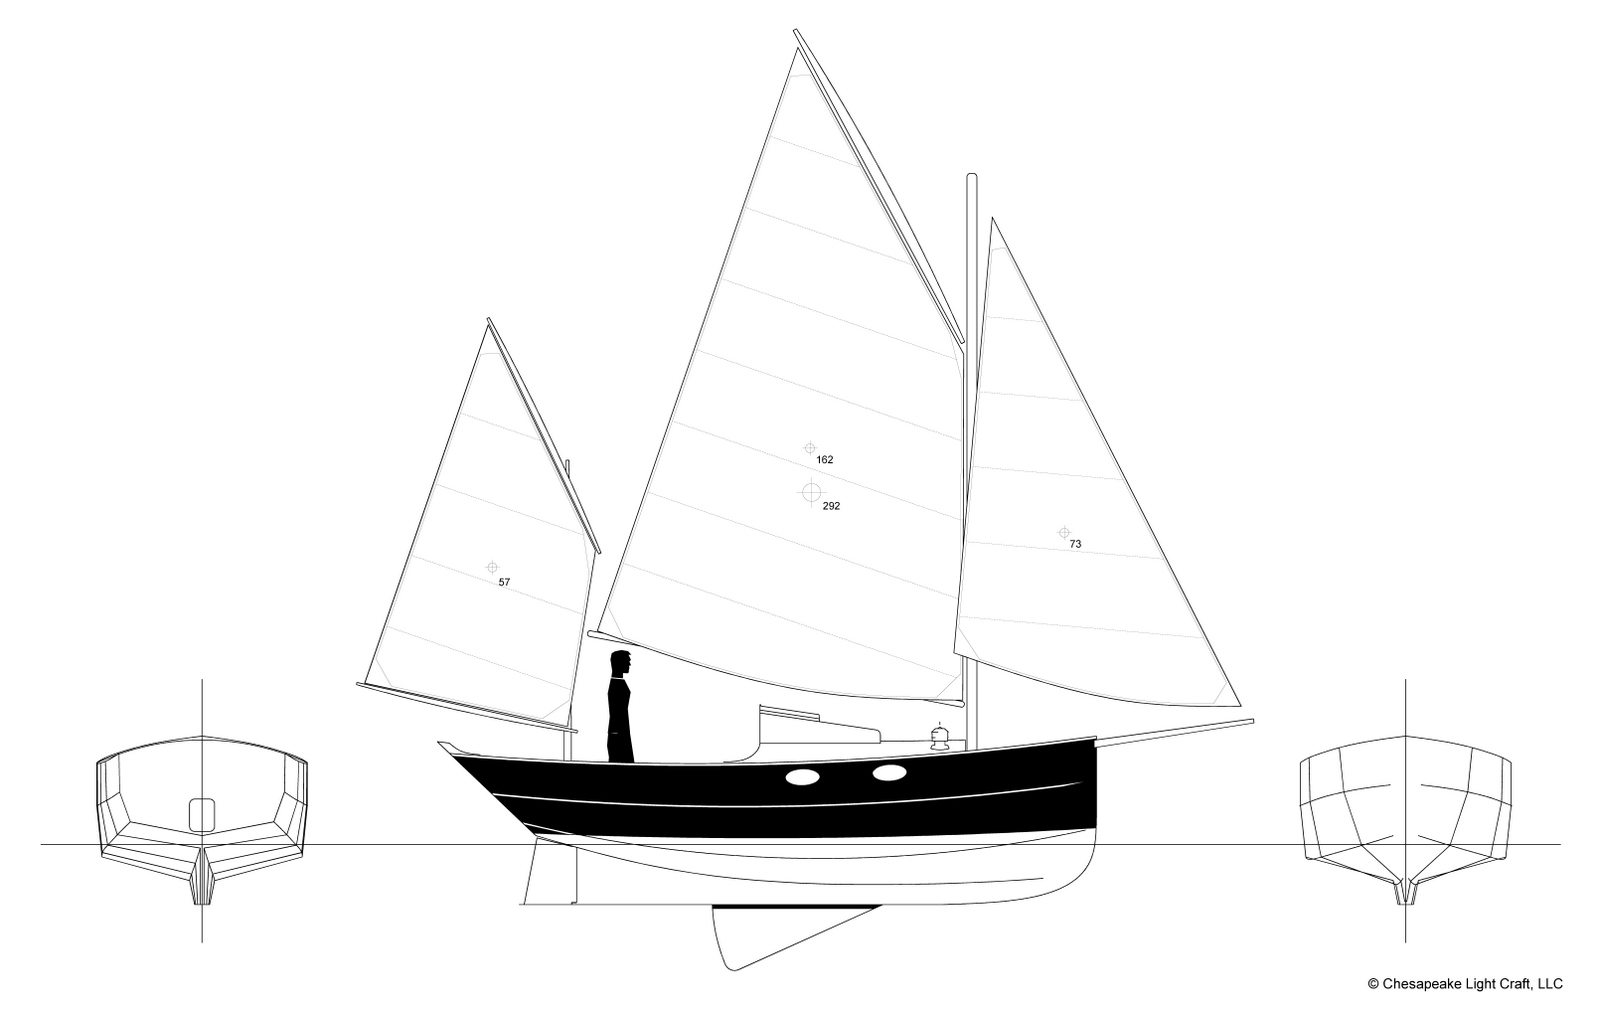 ' ' from the web at 'https://www.clcboats.com/images/blog/Bigger%20PocketShip/PocketShip%20III%20-%20Render.jpg'